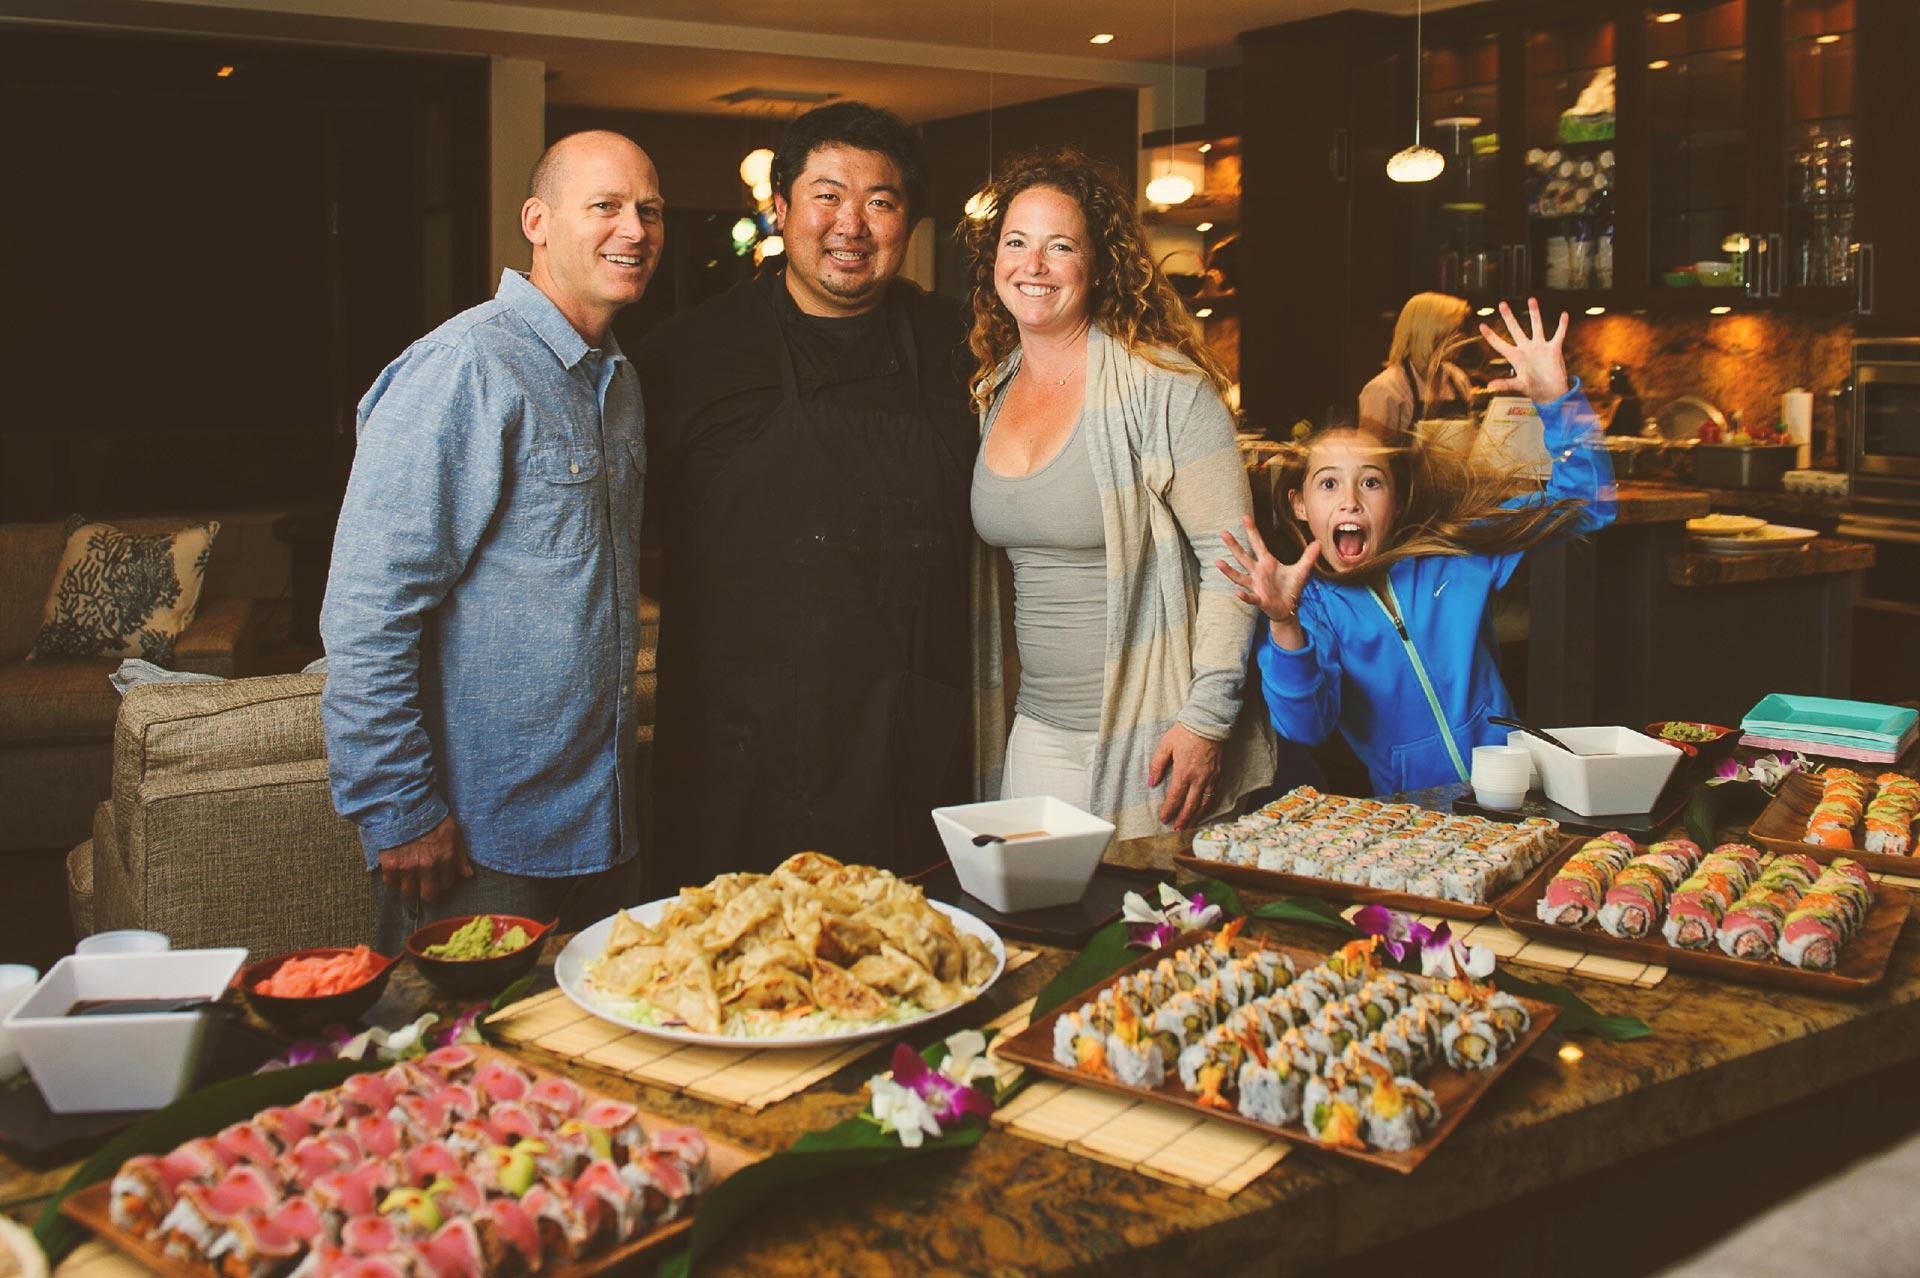 akioni-catering-authentic-japanese-cuisine-sushi-teppanyaki-hawaiian-bbq-aki-murao.jpg